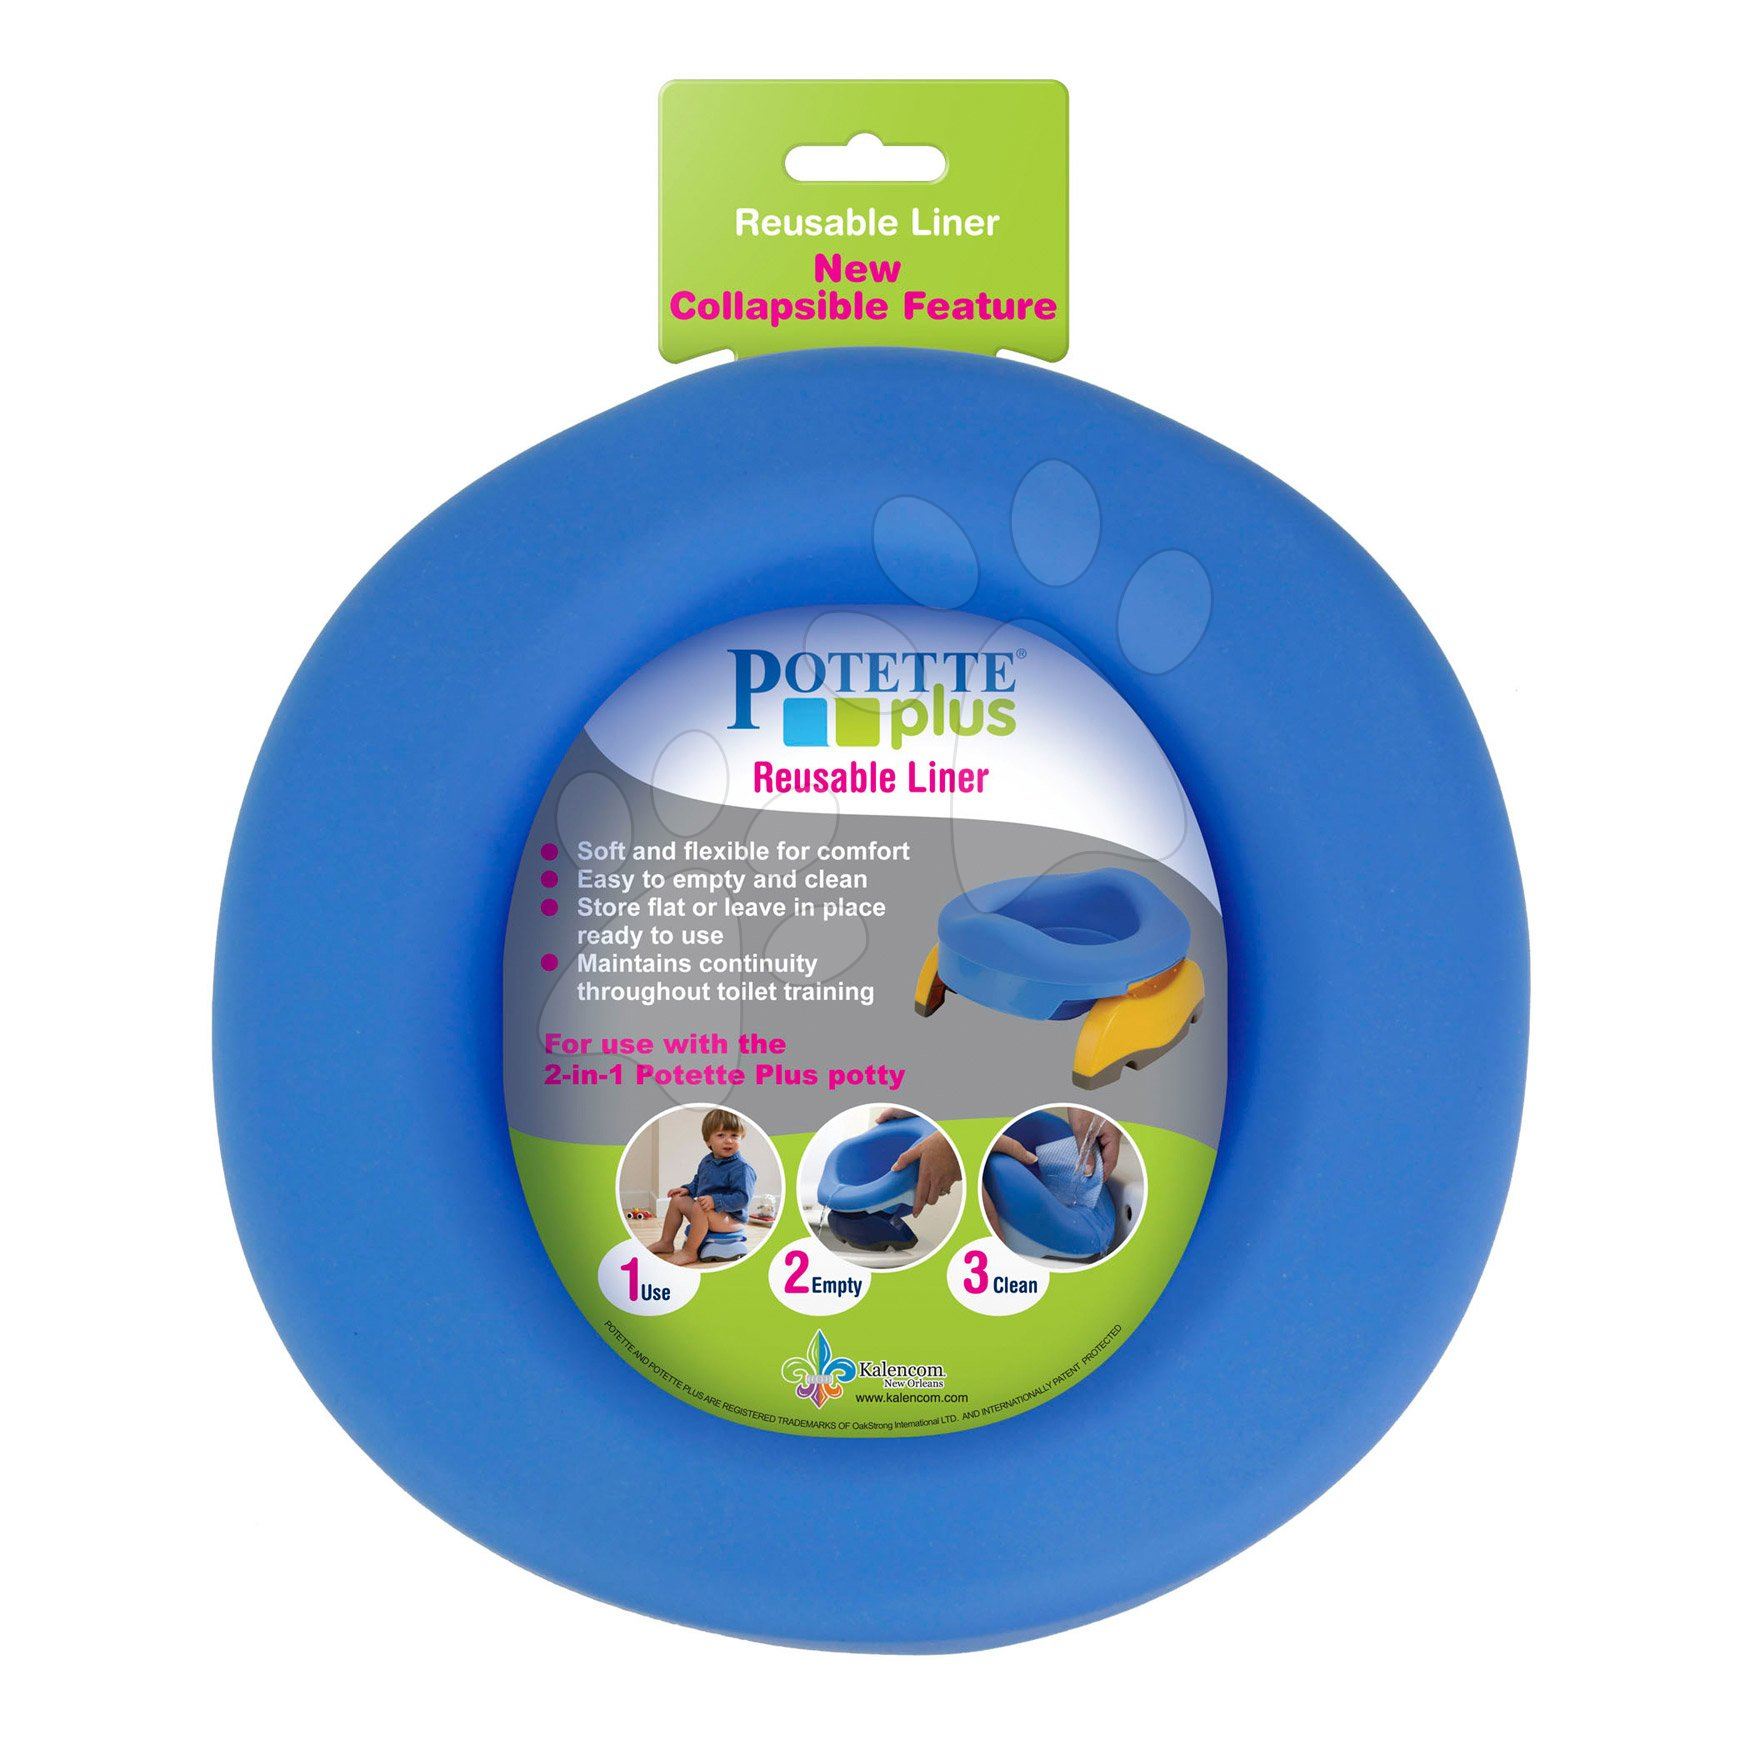 Nočníky a redukcie na toaletu - Vložka do detského nočníka Potette Plus gumená modrá